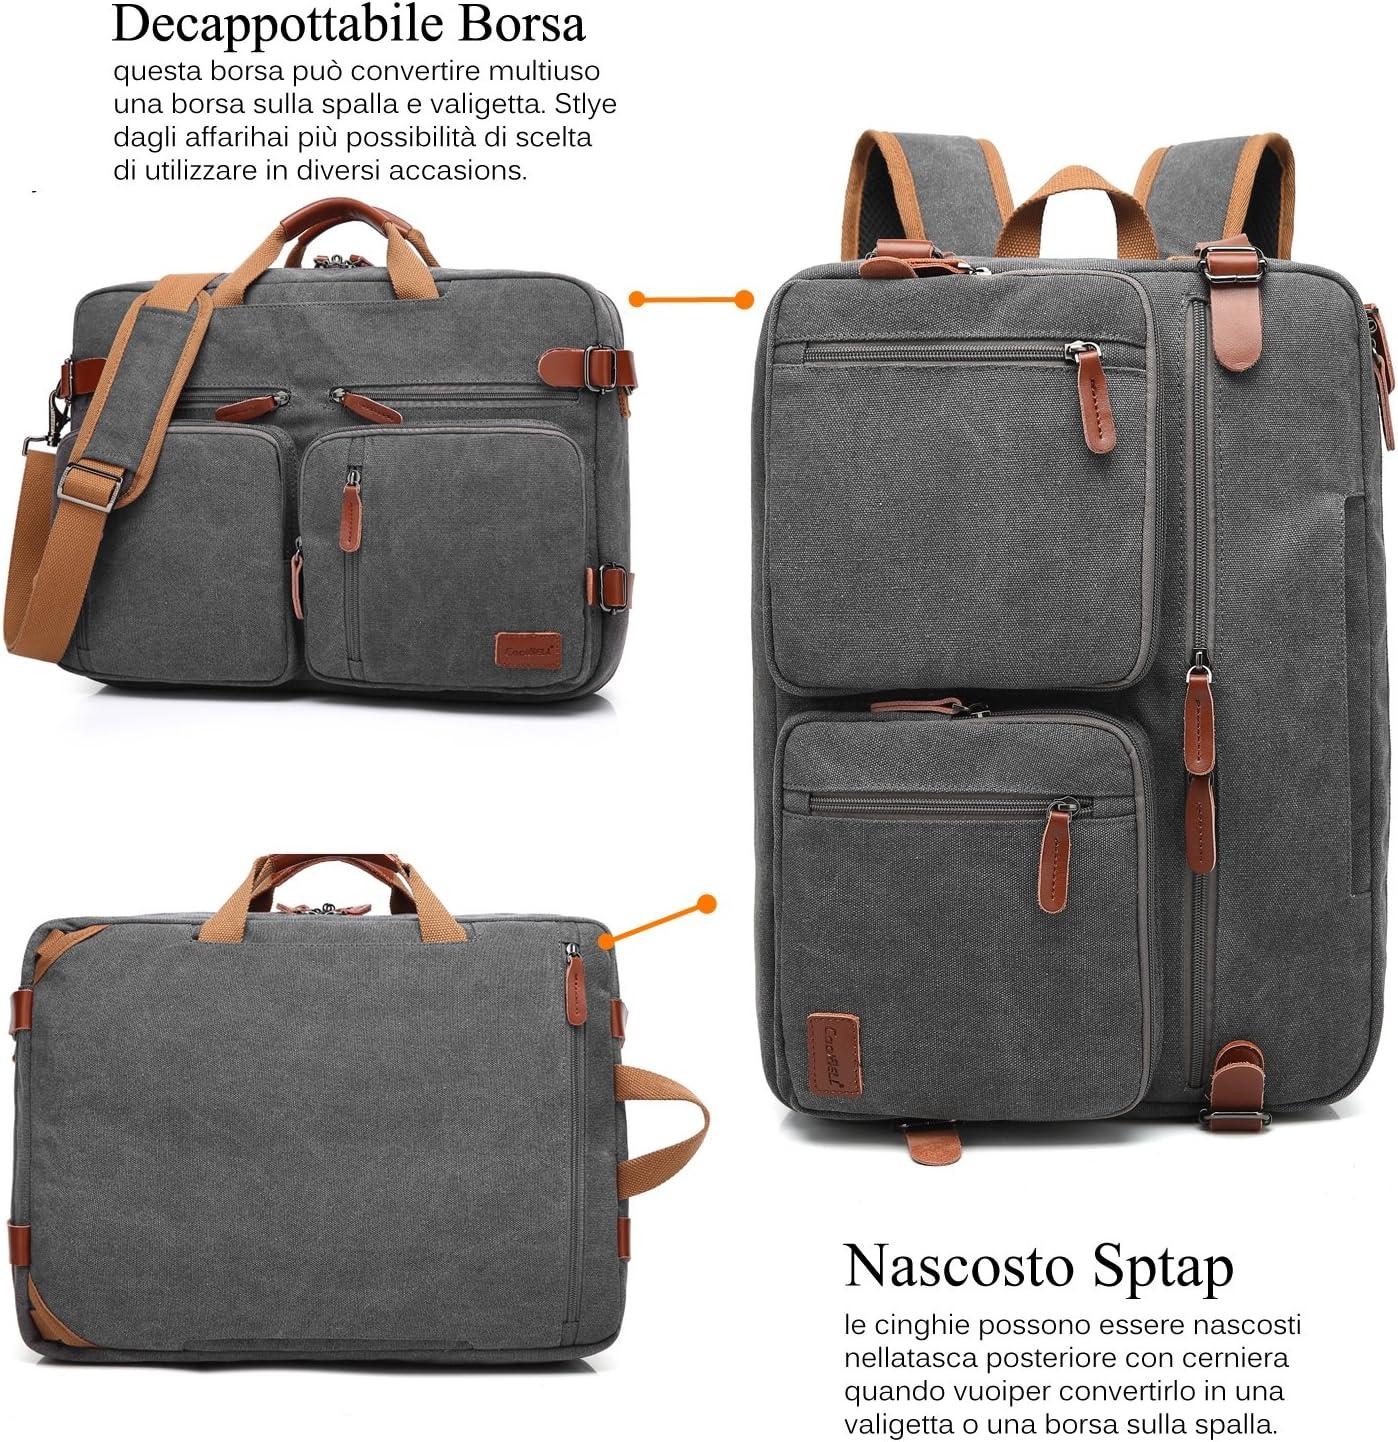 Lifewit 15.6 pollici IMPERMEABILE Cerato Tela Laptop Messenger bag vintage in pelle